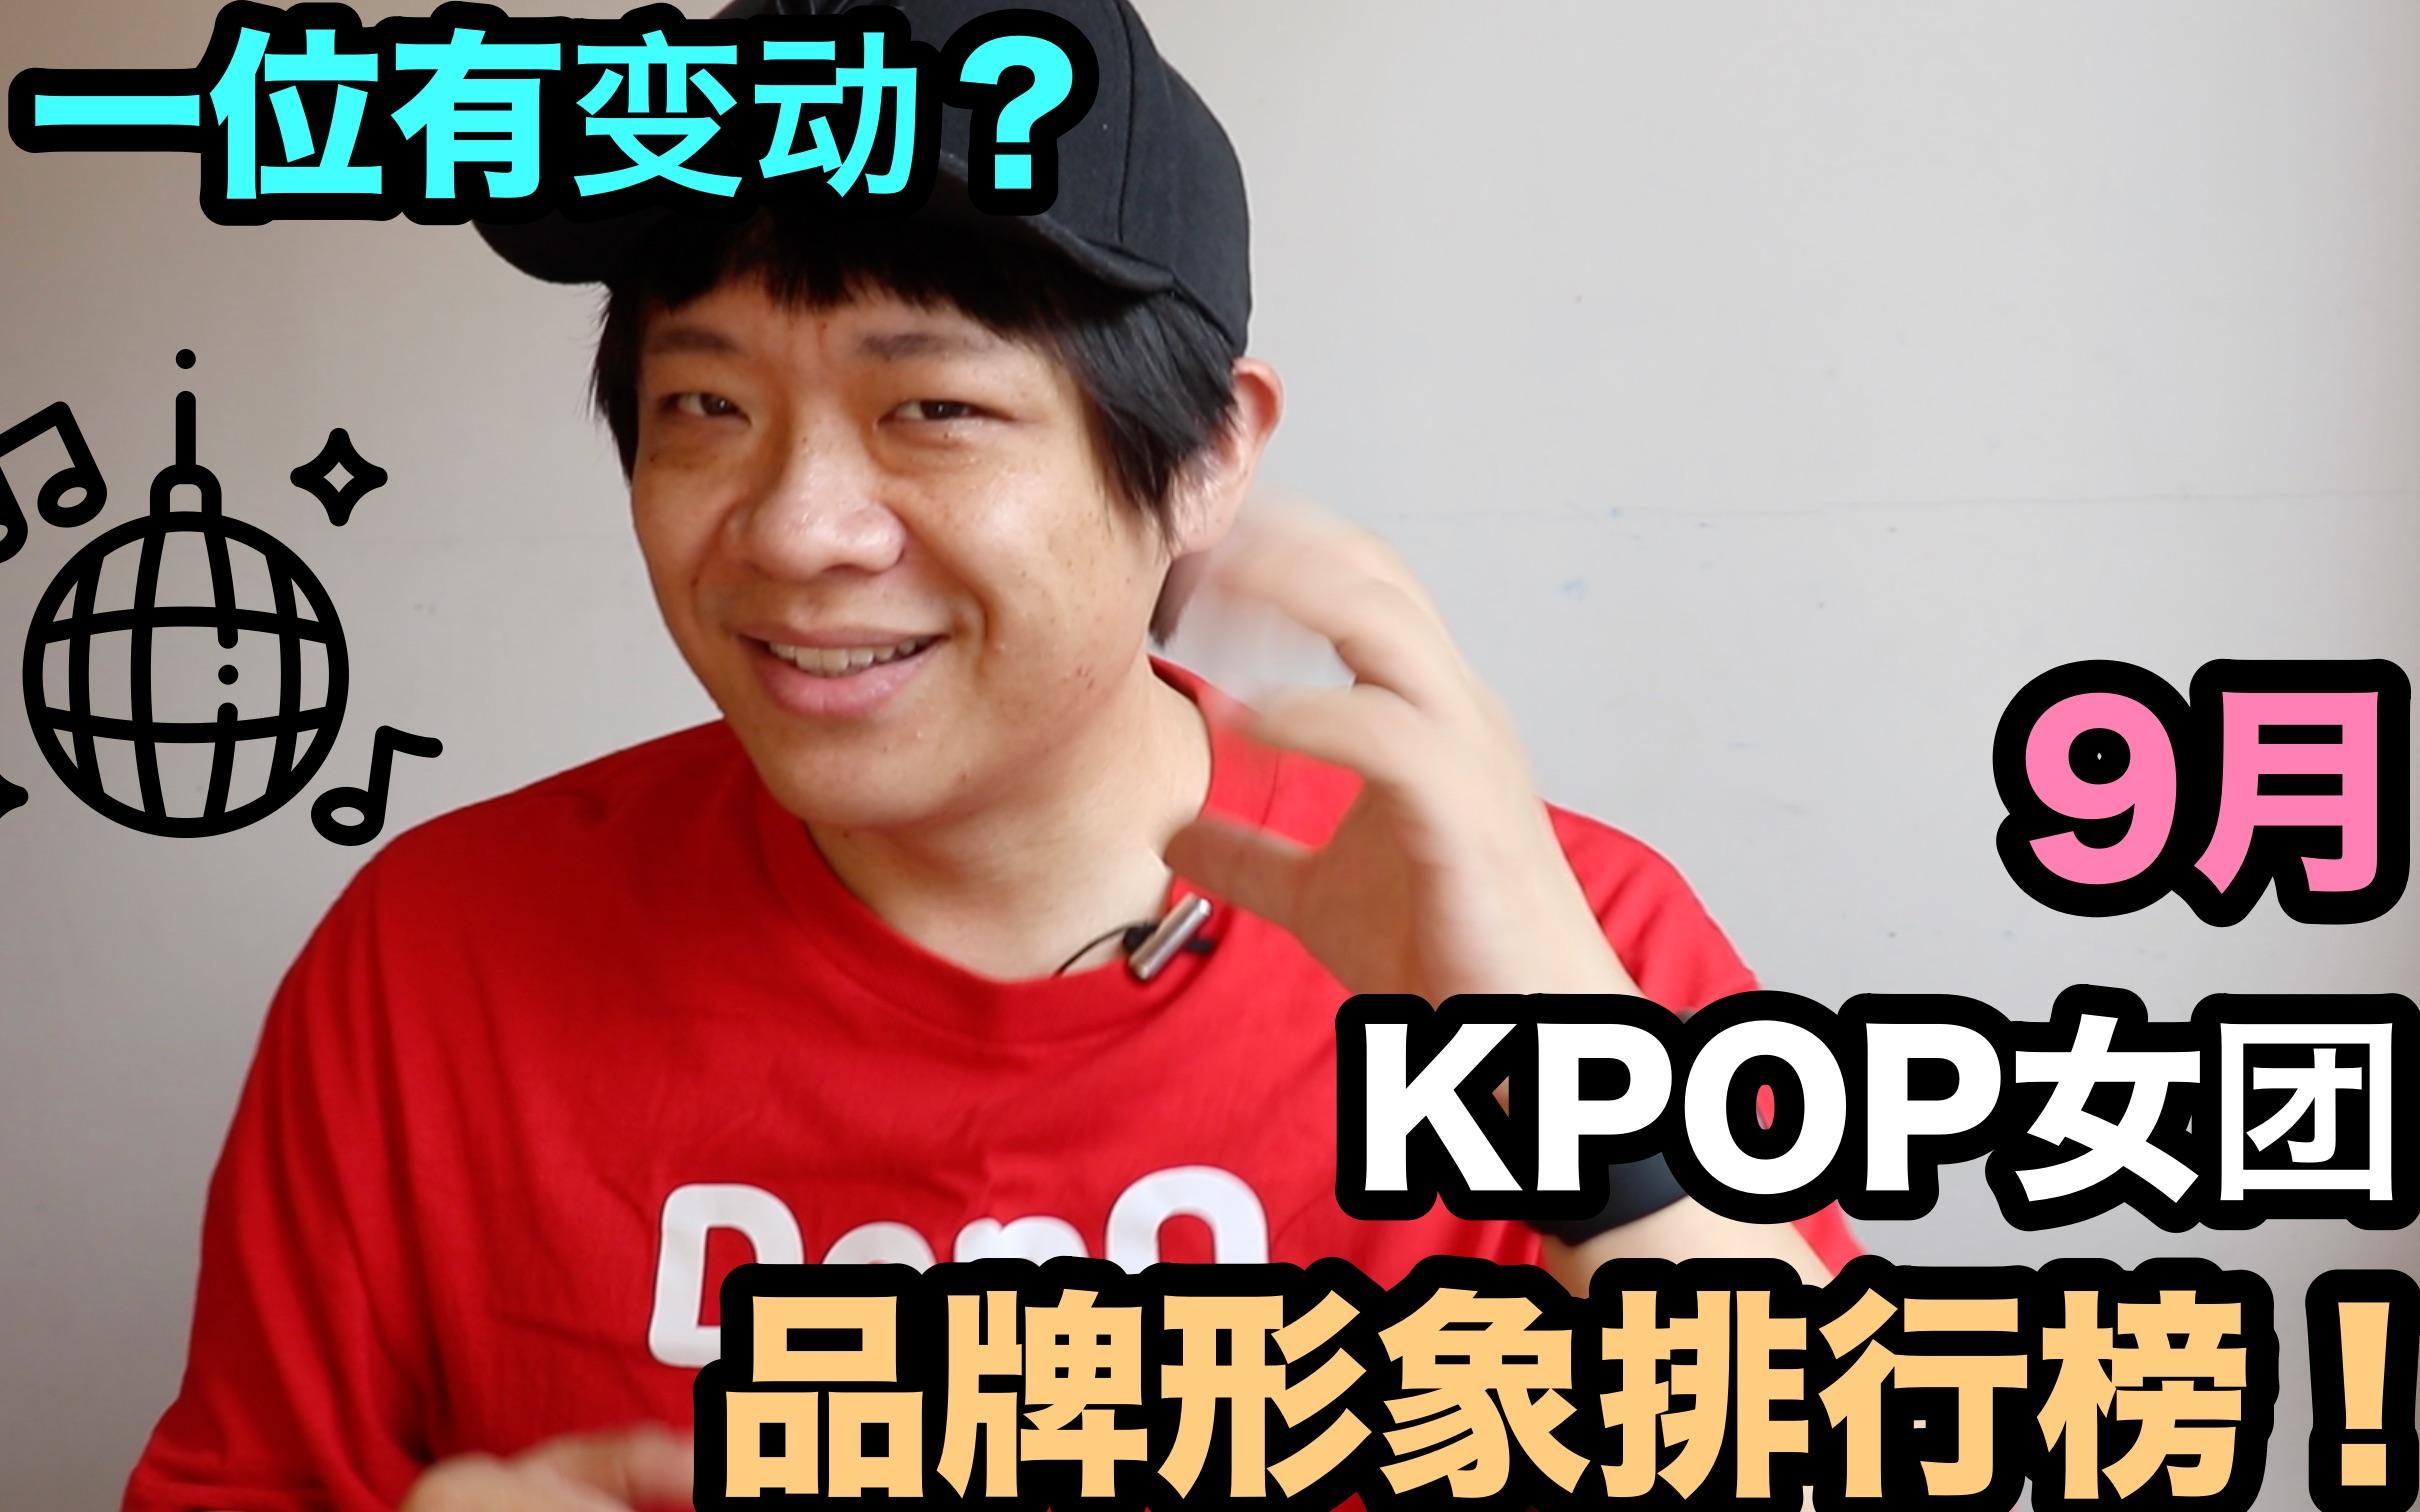 一位有變動..? 9月KPOP女團 品牌形象排行榜????! DenQ_嗶哩嗶哩 (゜-゜)つロ 干杯~-bilibili